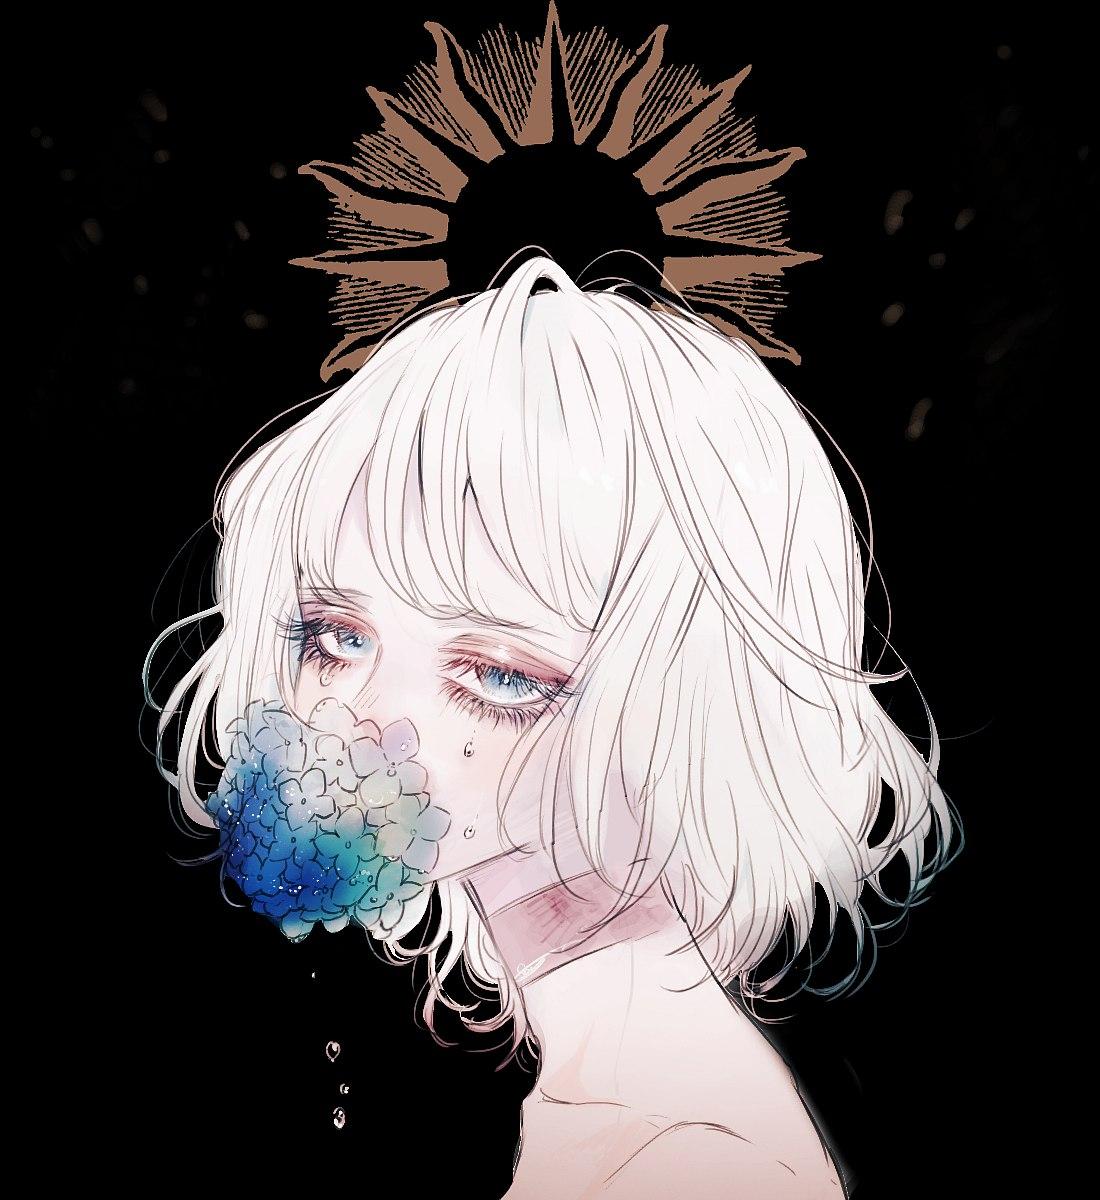 PsN50d8HcGc.jpg (1100×1200) Cute art, Anime art girl